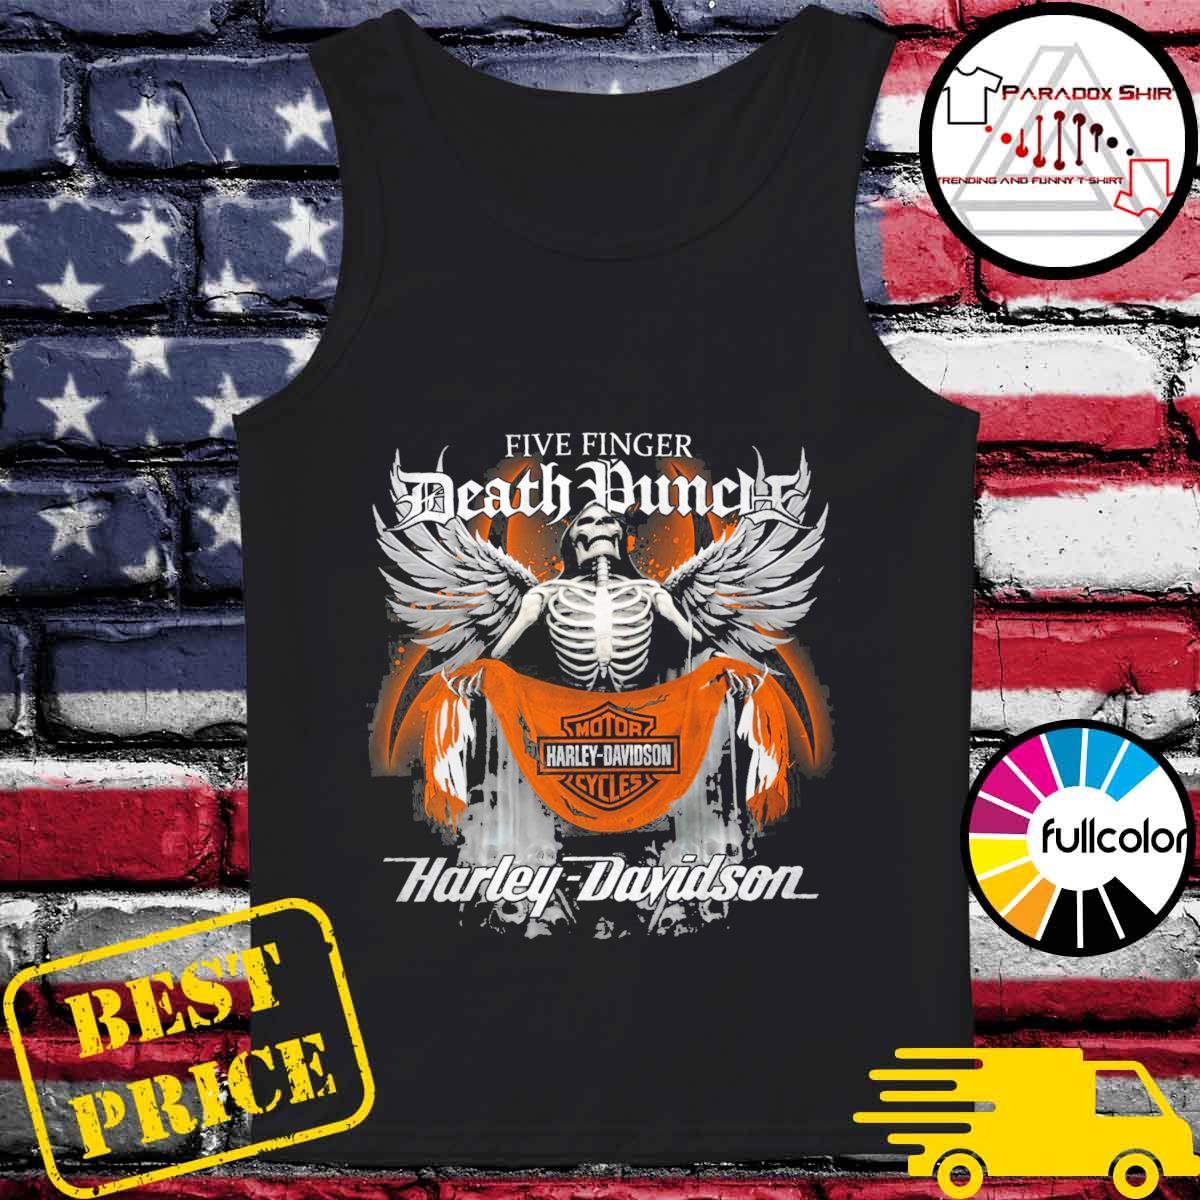 Five Finger Death Punch Motor harley Davidson Cycles Harley Davidson s Tank-top